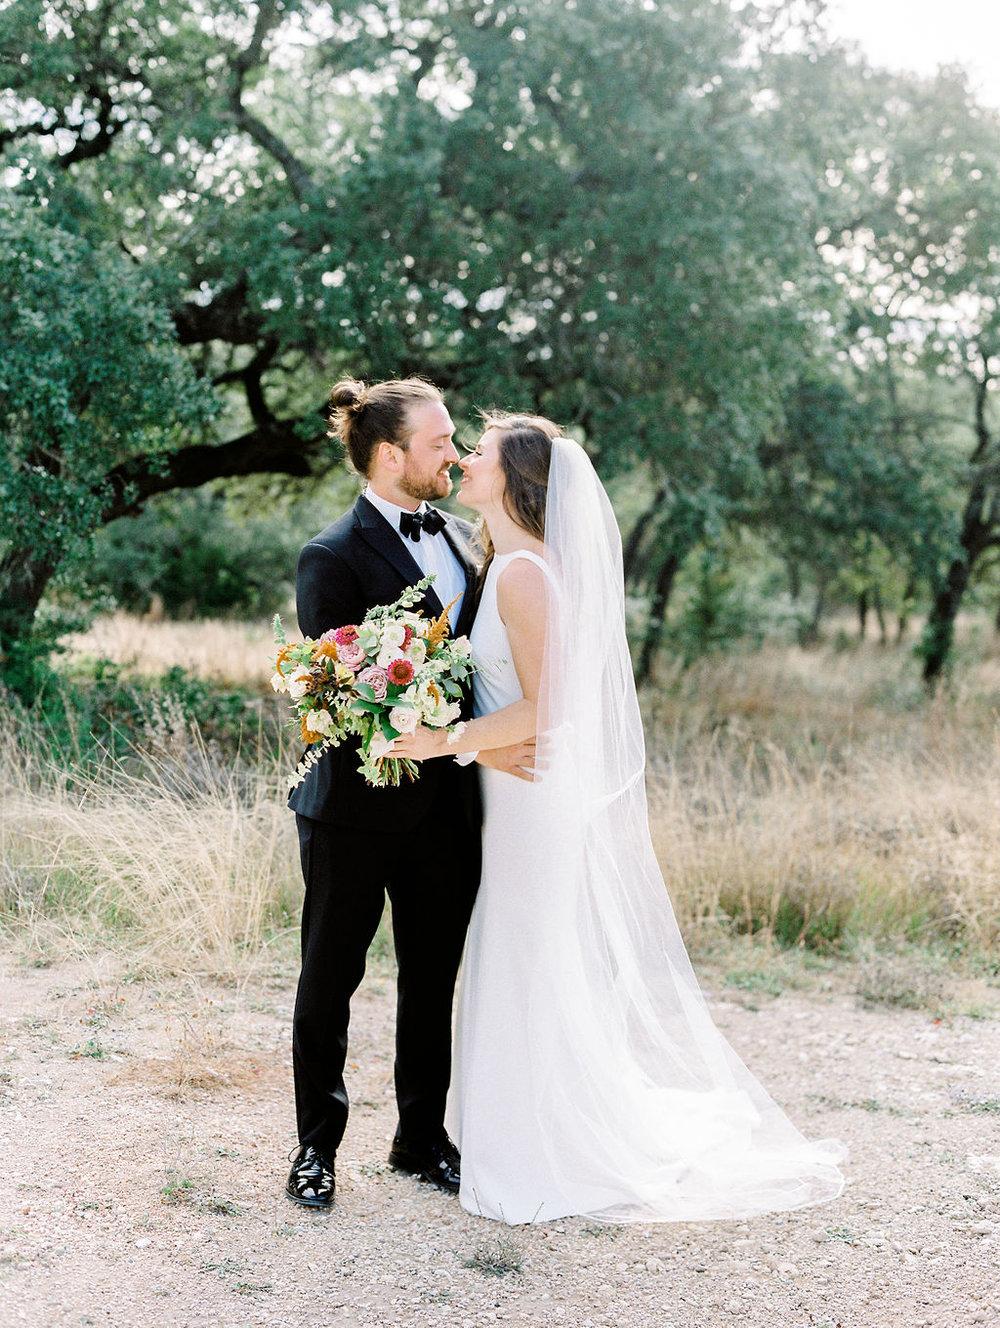 Austin-Texas-Wedding-Photographer-Addison-Grove-Film-39.jpg